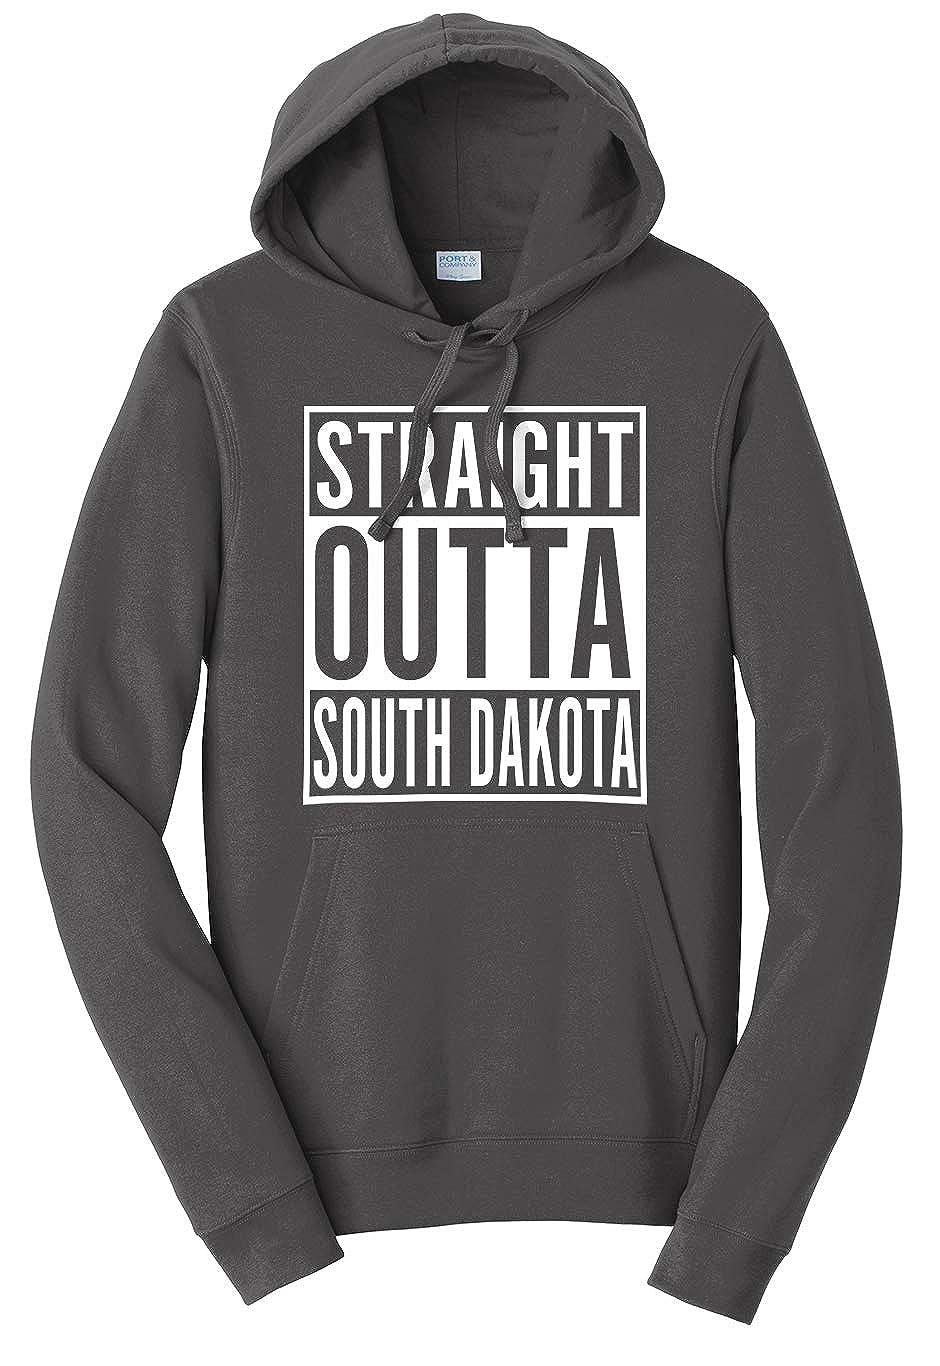 Tenacitee Unisex Straight Outta South Dakota Sweatshirt